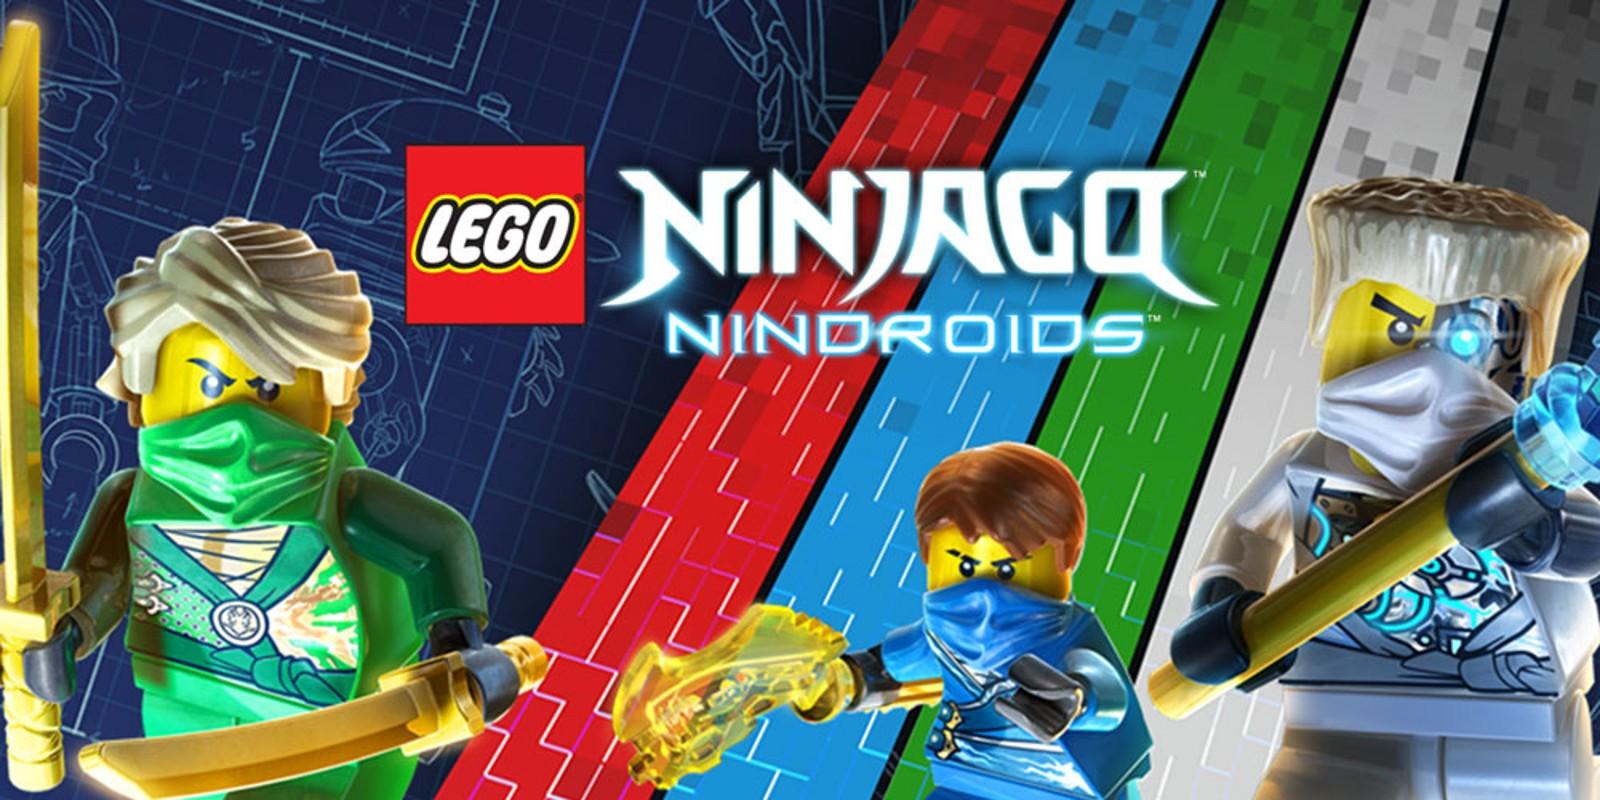 Lego 174 Ninjago Nindroids Nintendo 3ds Games Nintendo